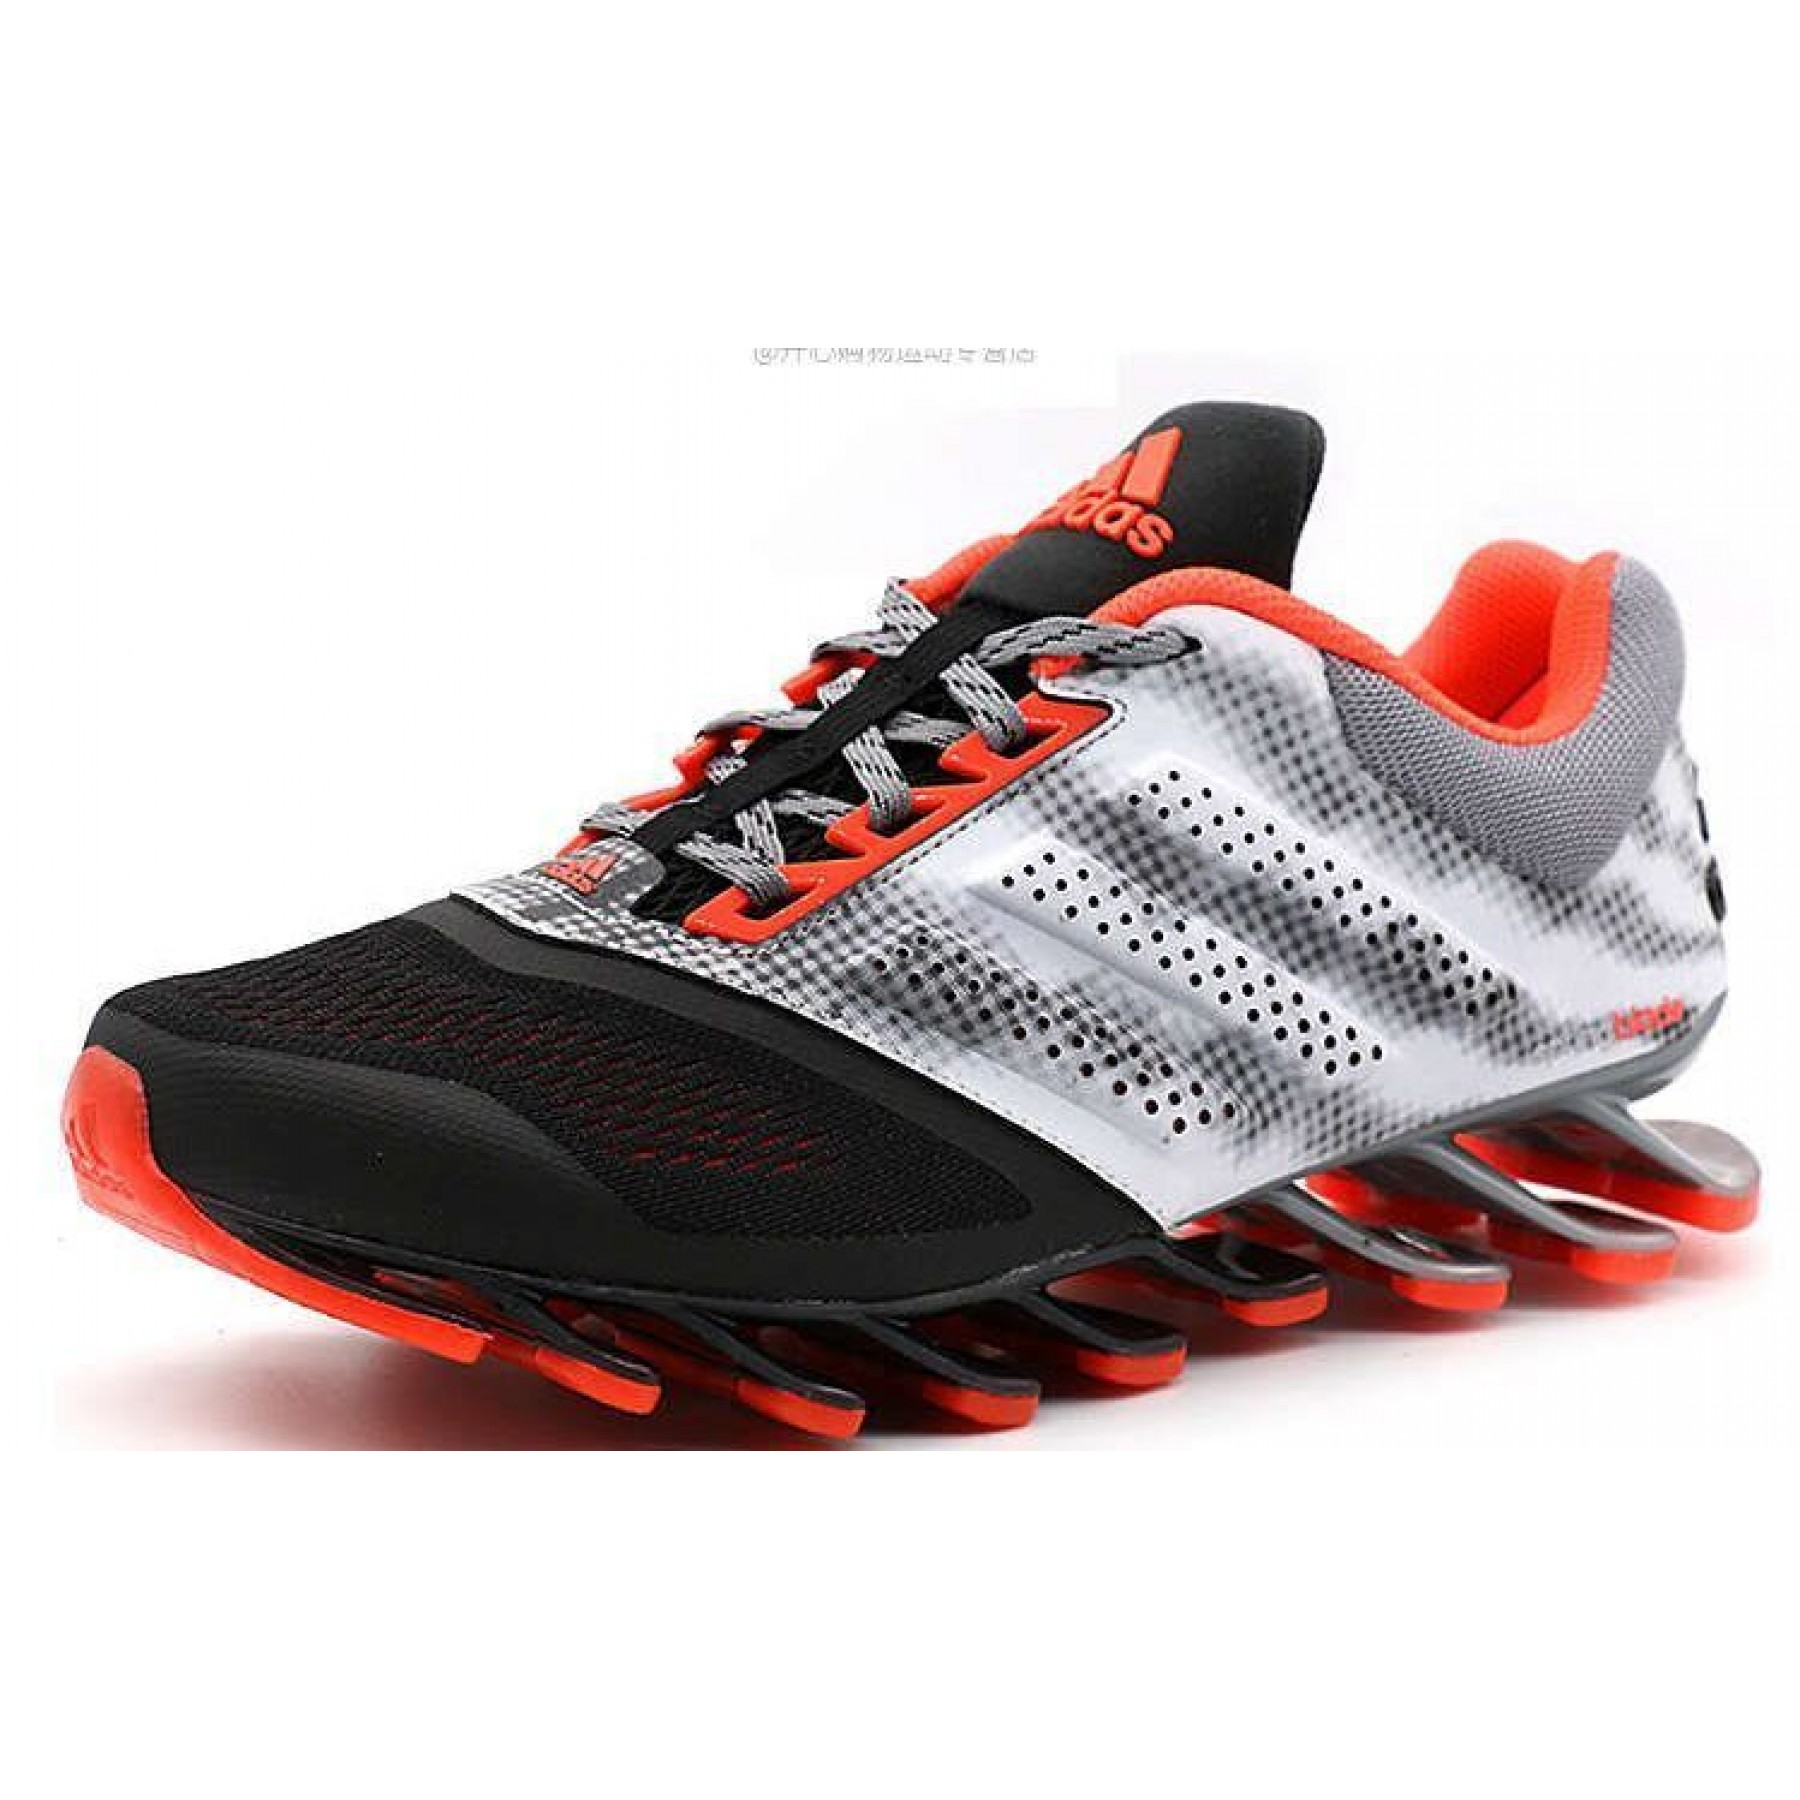 Tênis Adidas SpringBlade Drive 2.0 Masculino Preto Laranja e Cinza Cod 0685 79d0efb1a8502